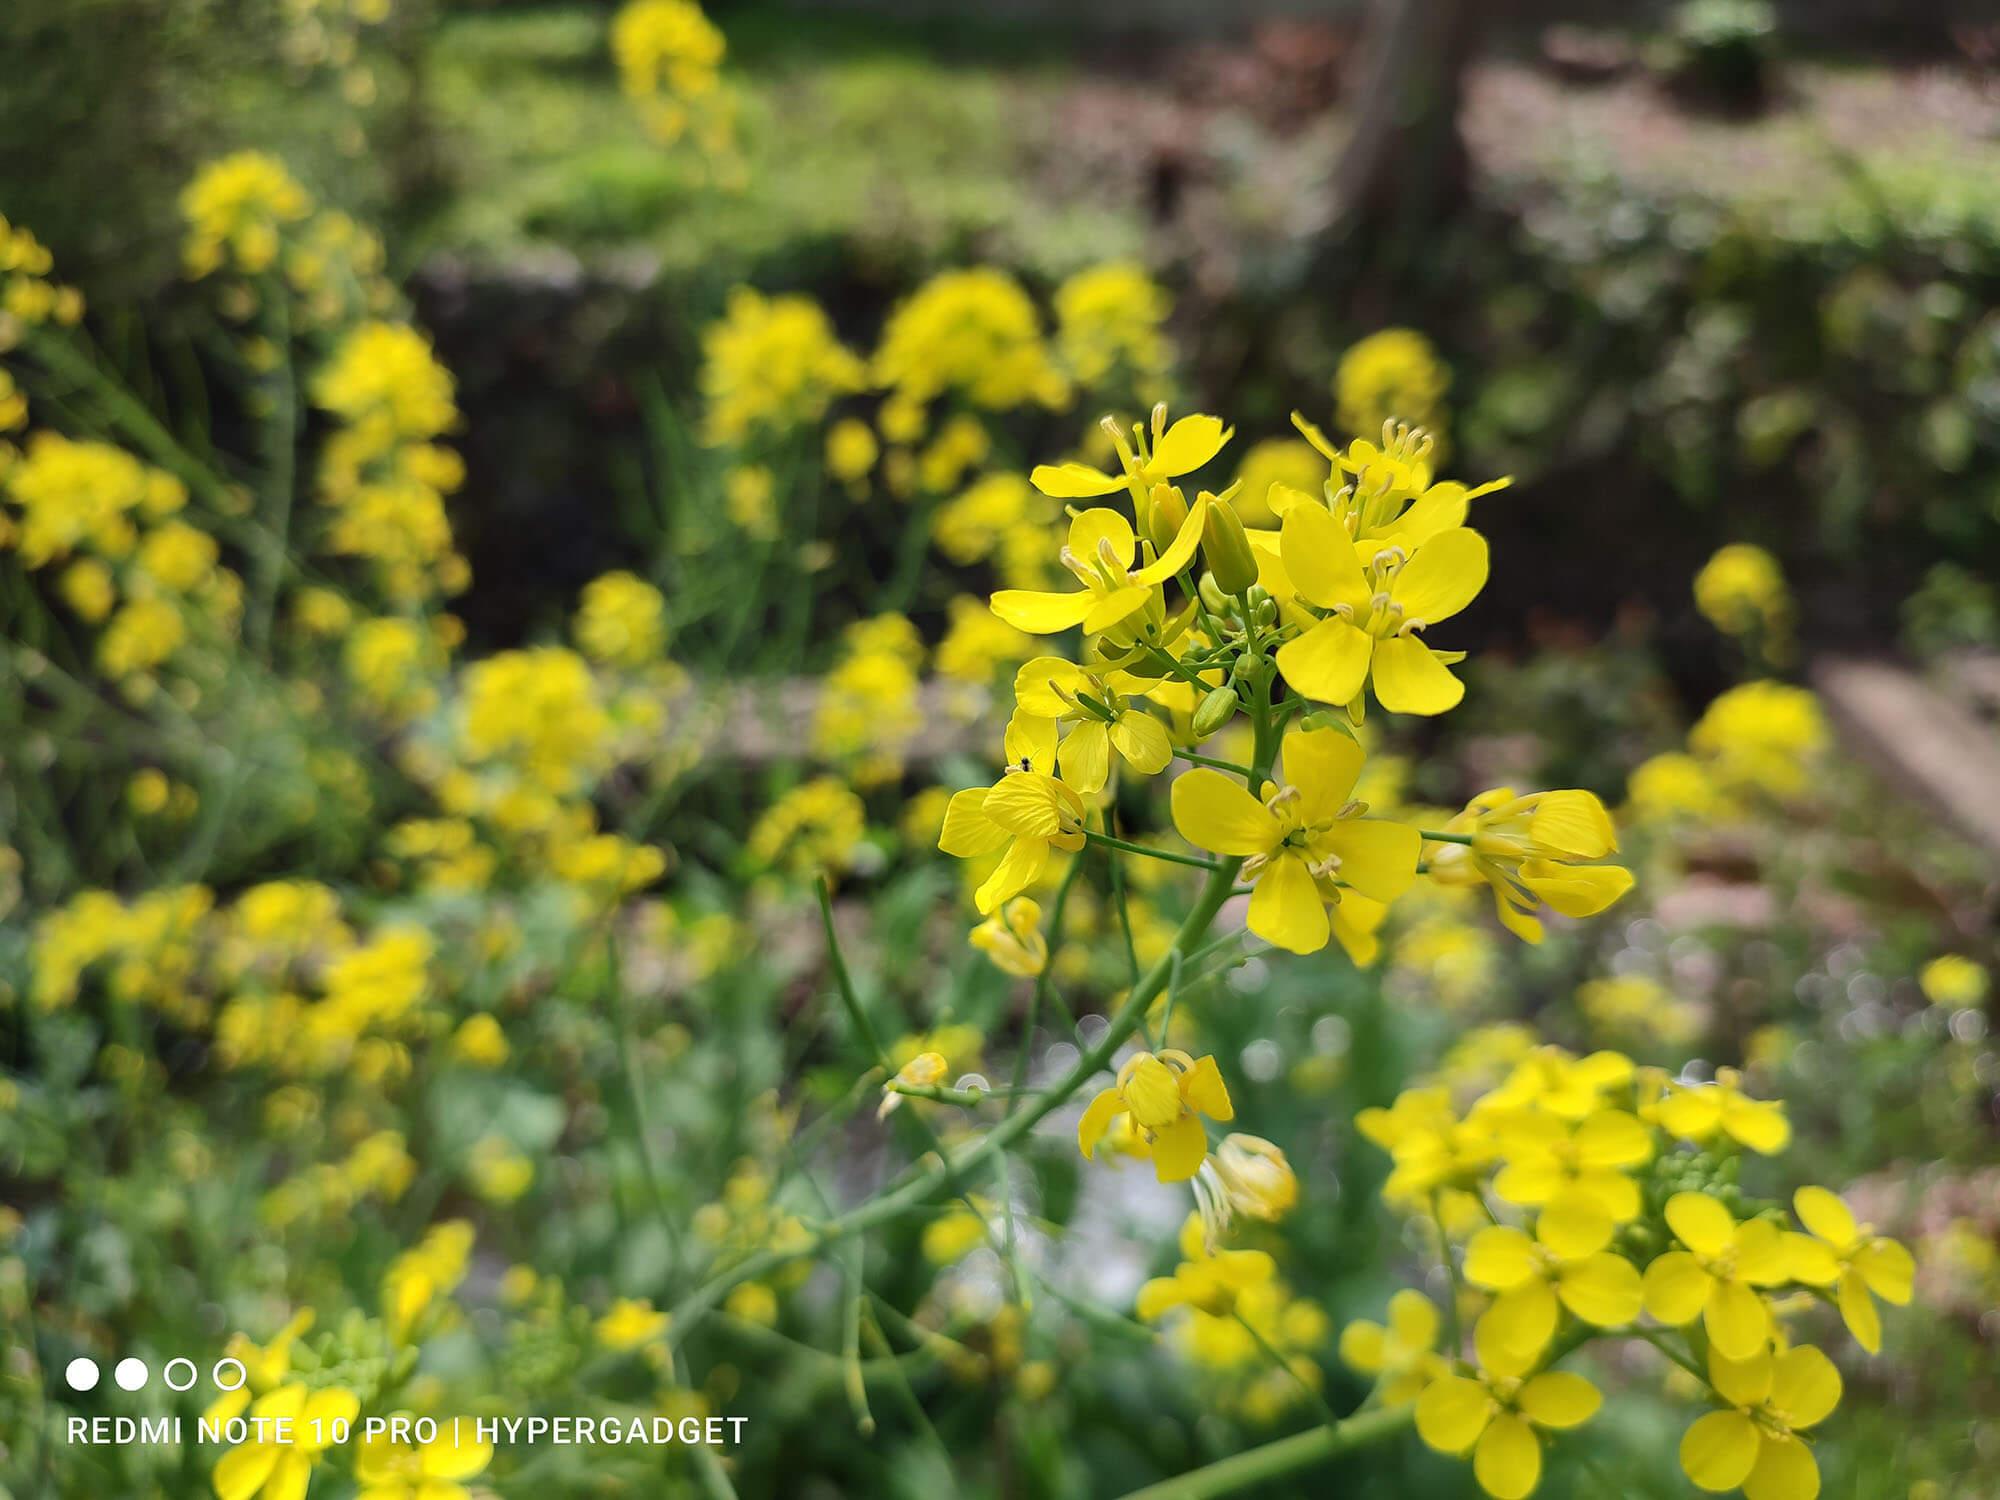 Redmi Note 10 Proで撮影した菜の花の画像